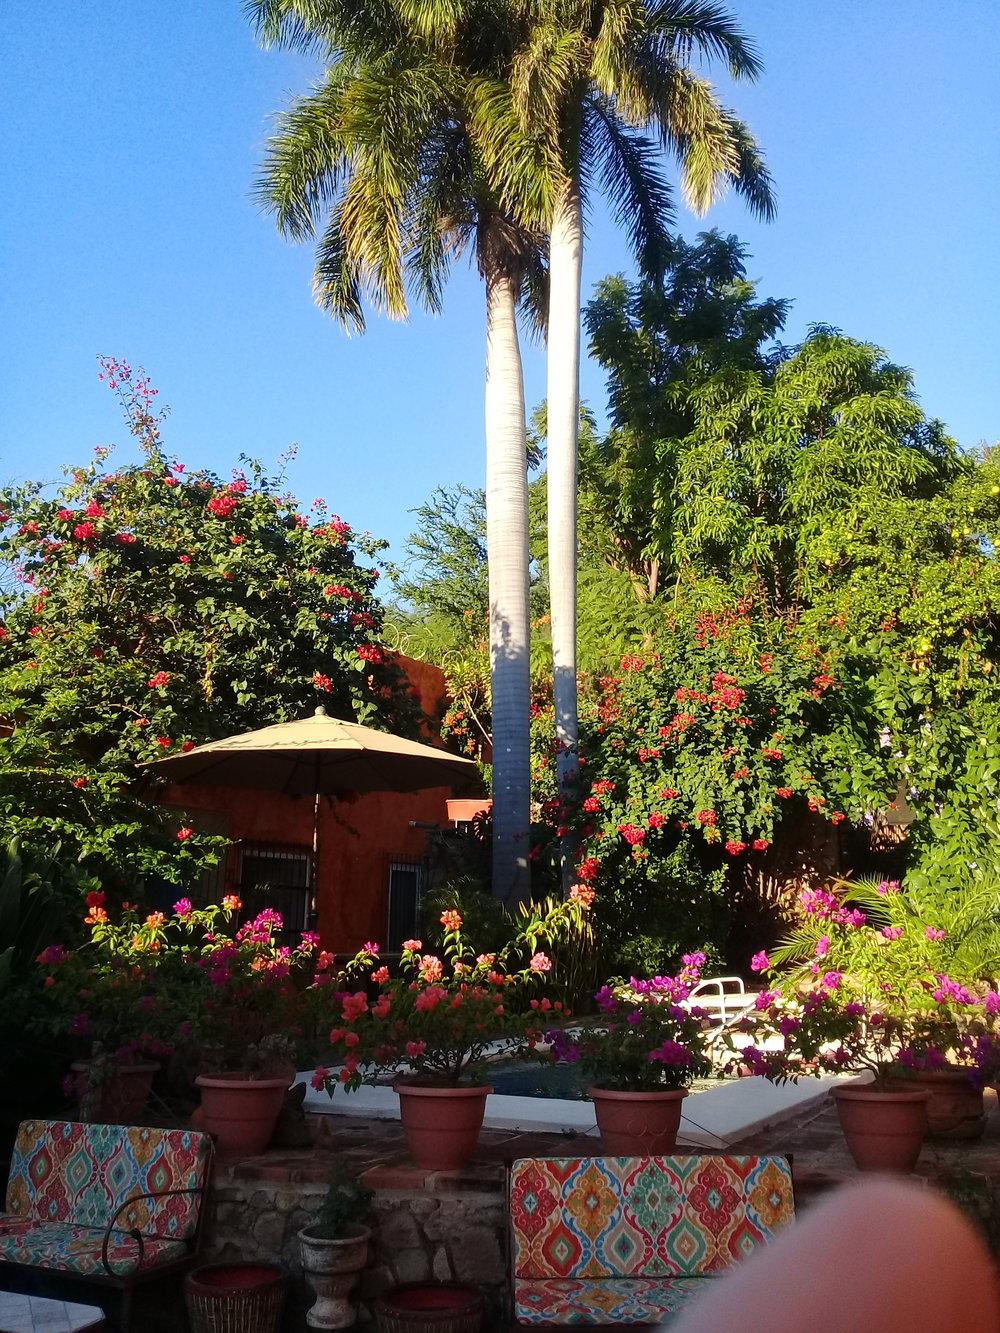 palm and pool.jpg